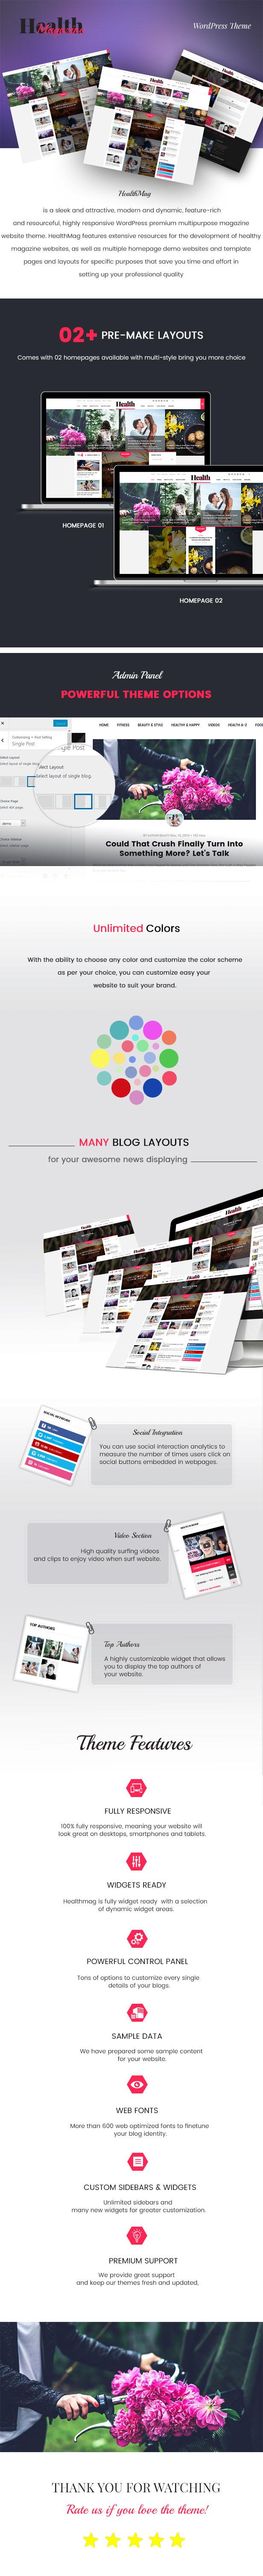 HealthMag - Multipurpose News/Magazine WordPress Theme - 1